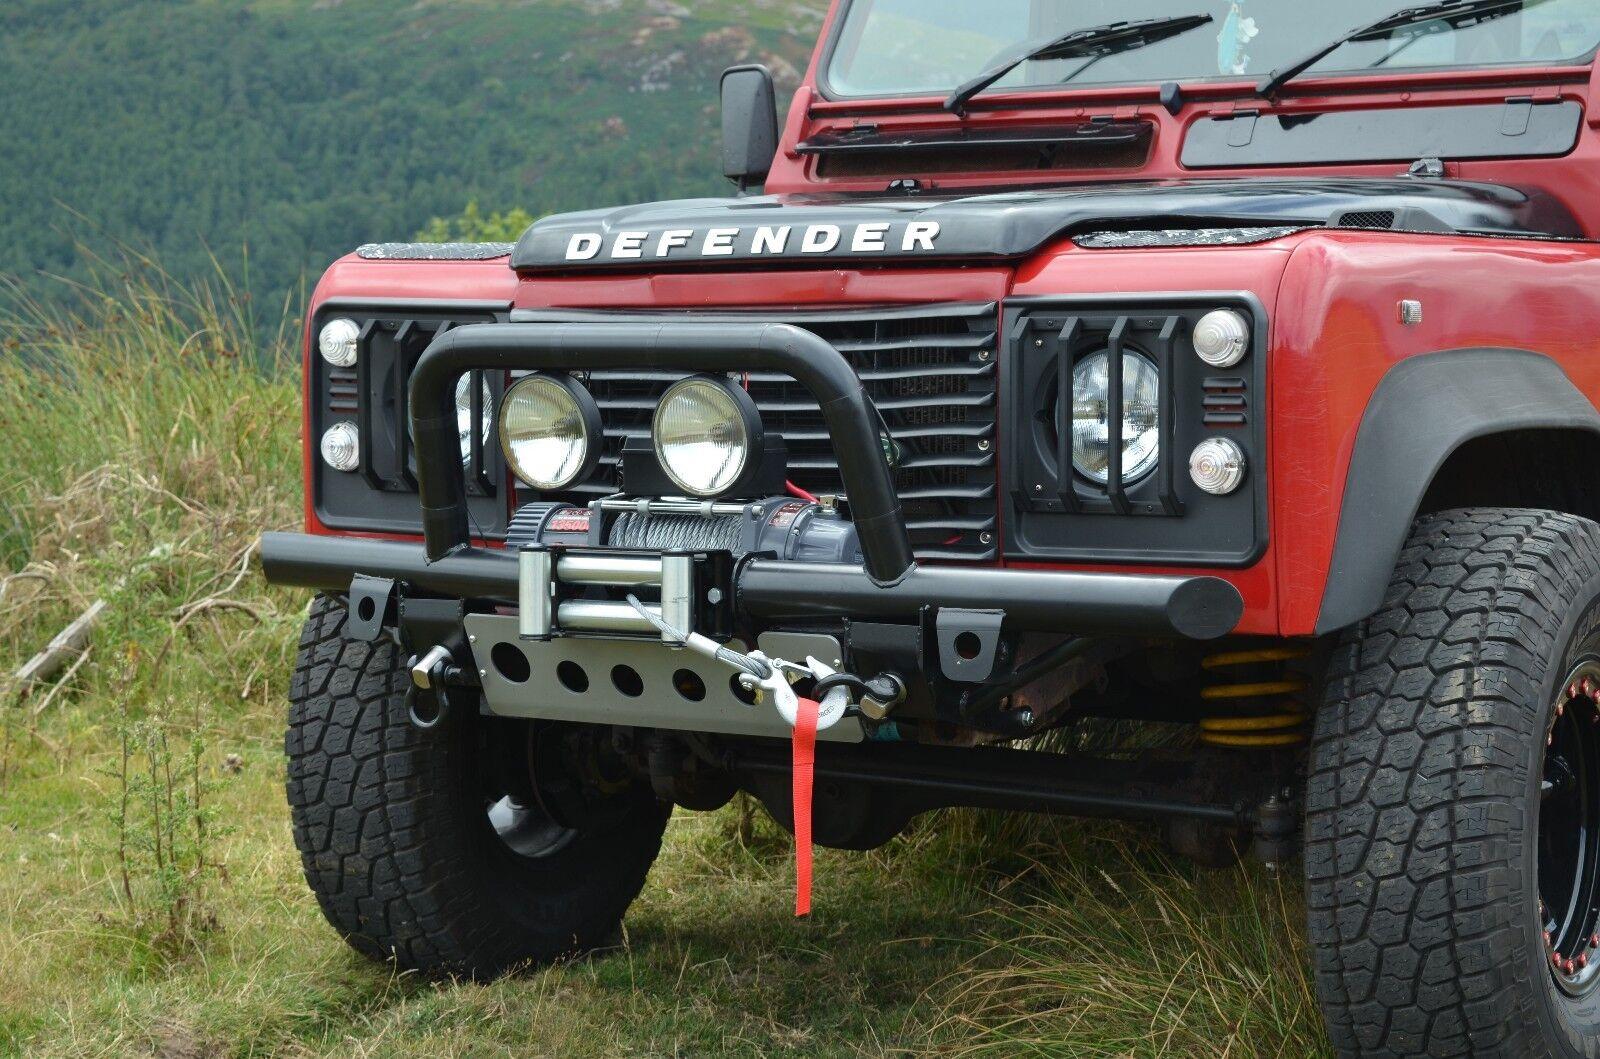 Head Light Lamp Grill Guards Land Rover Defender 90 110 130 Headlight Guard